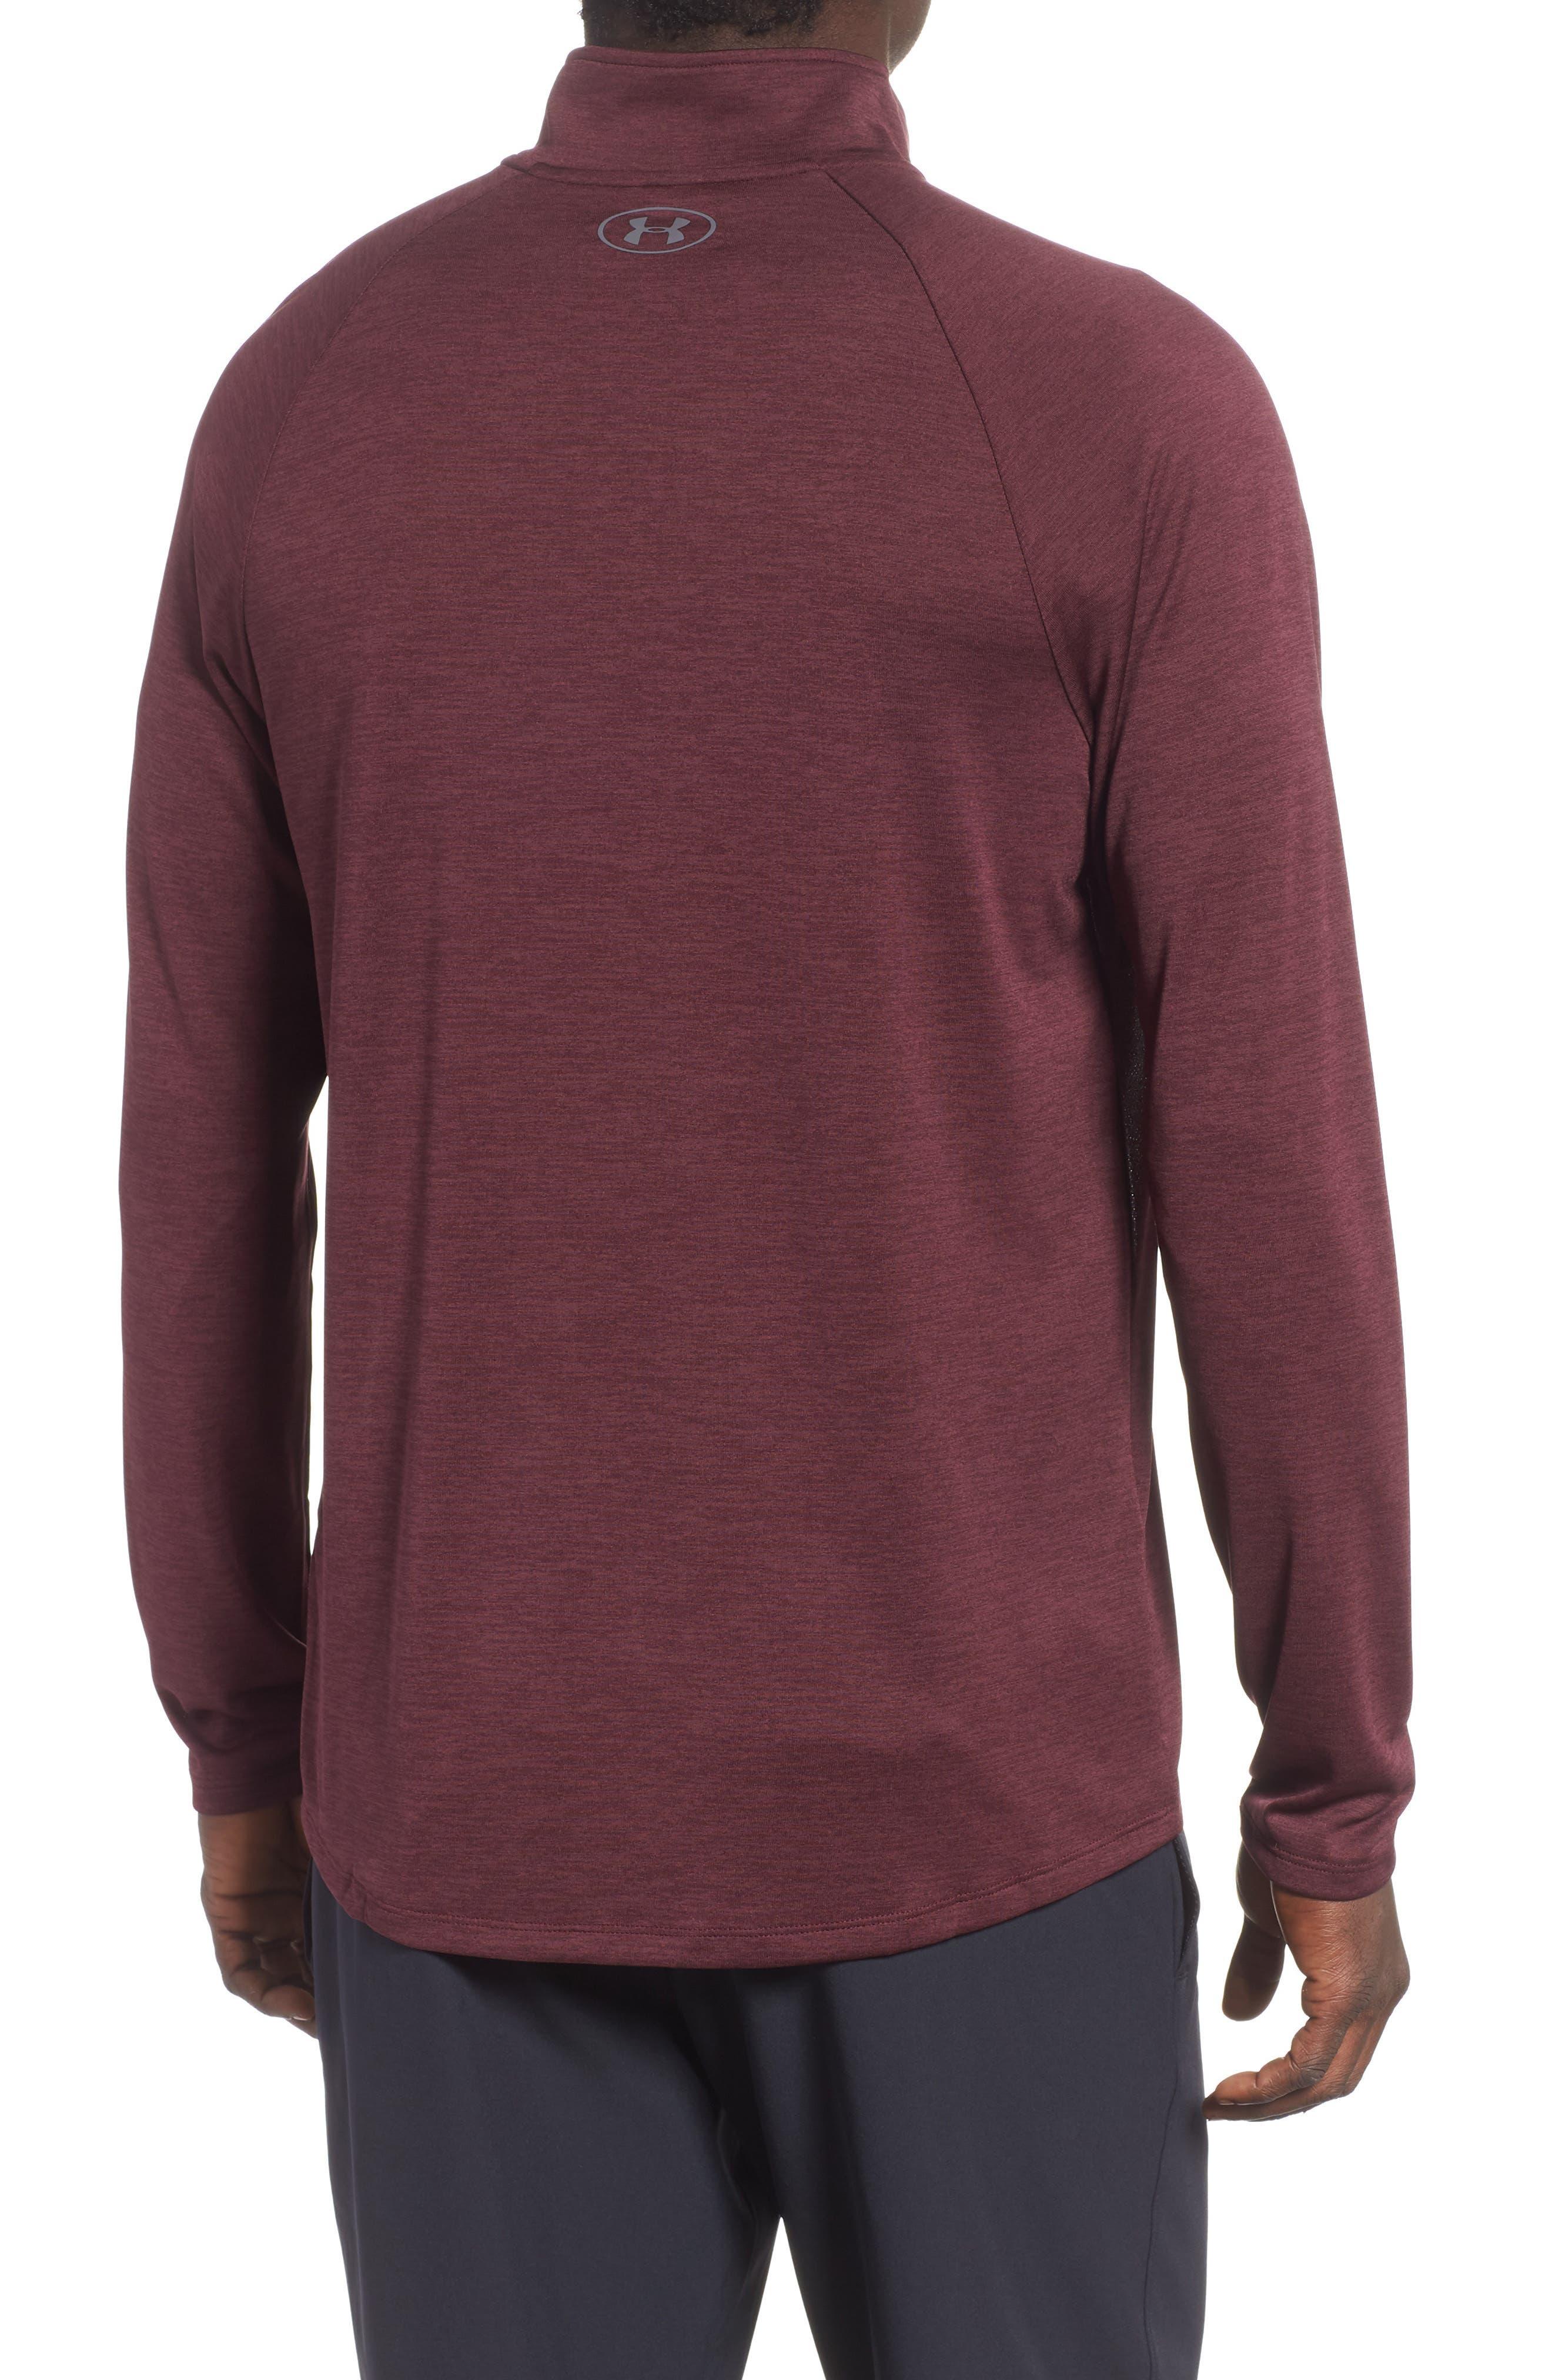 UNDER ARMOUR,                             Tech Half Zip Sweatshirt,                             Alternate thumbnail 2, color,                             600